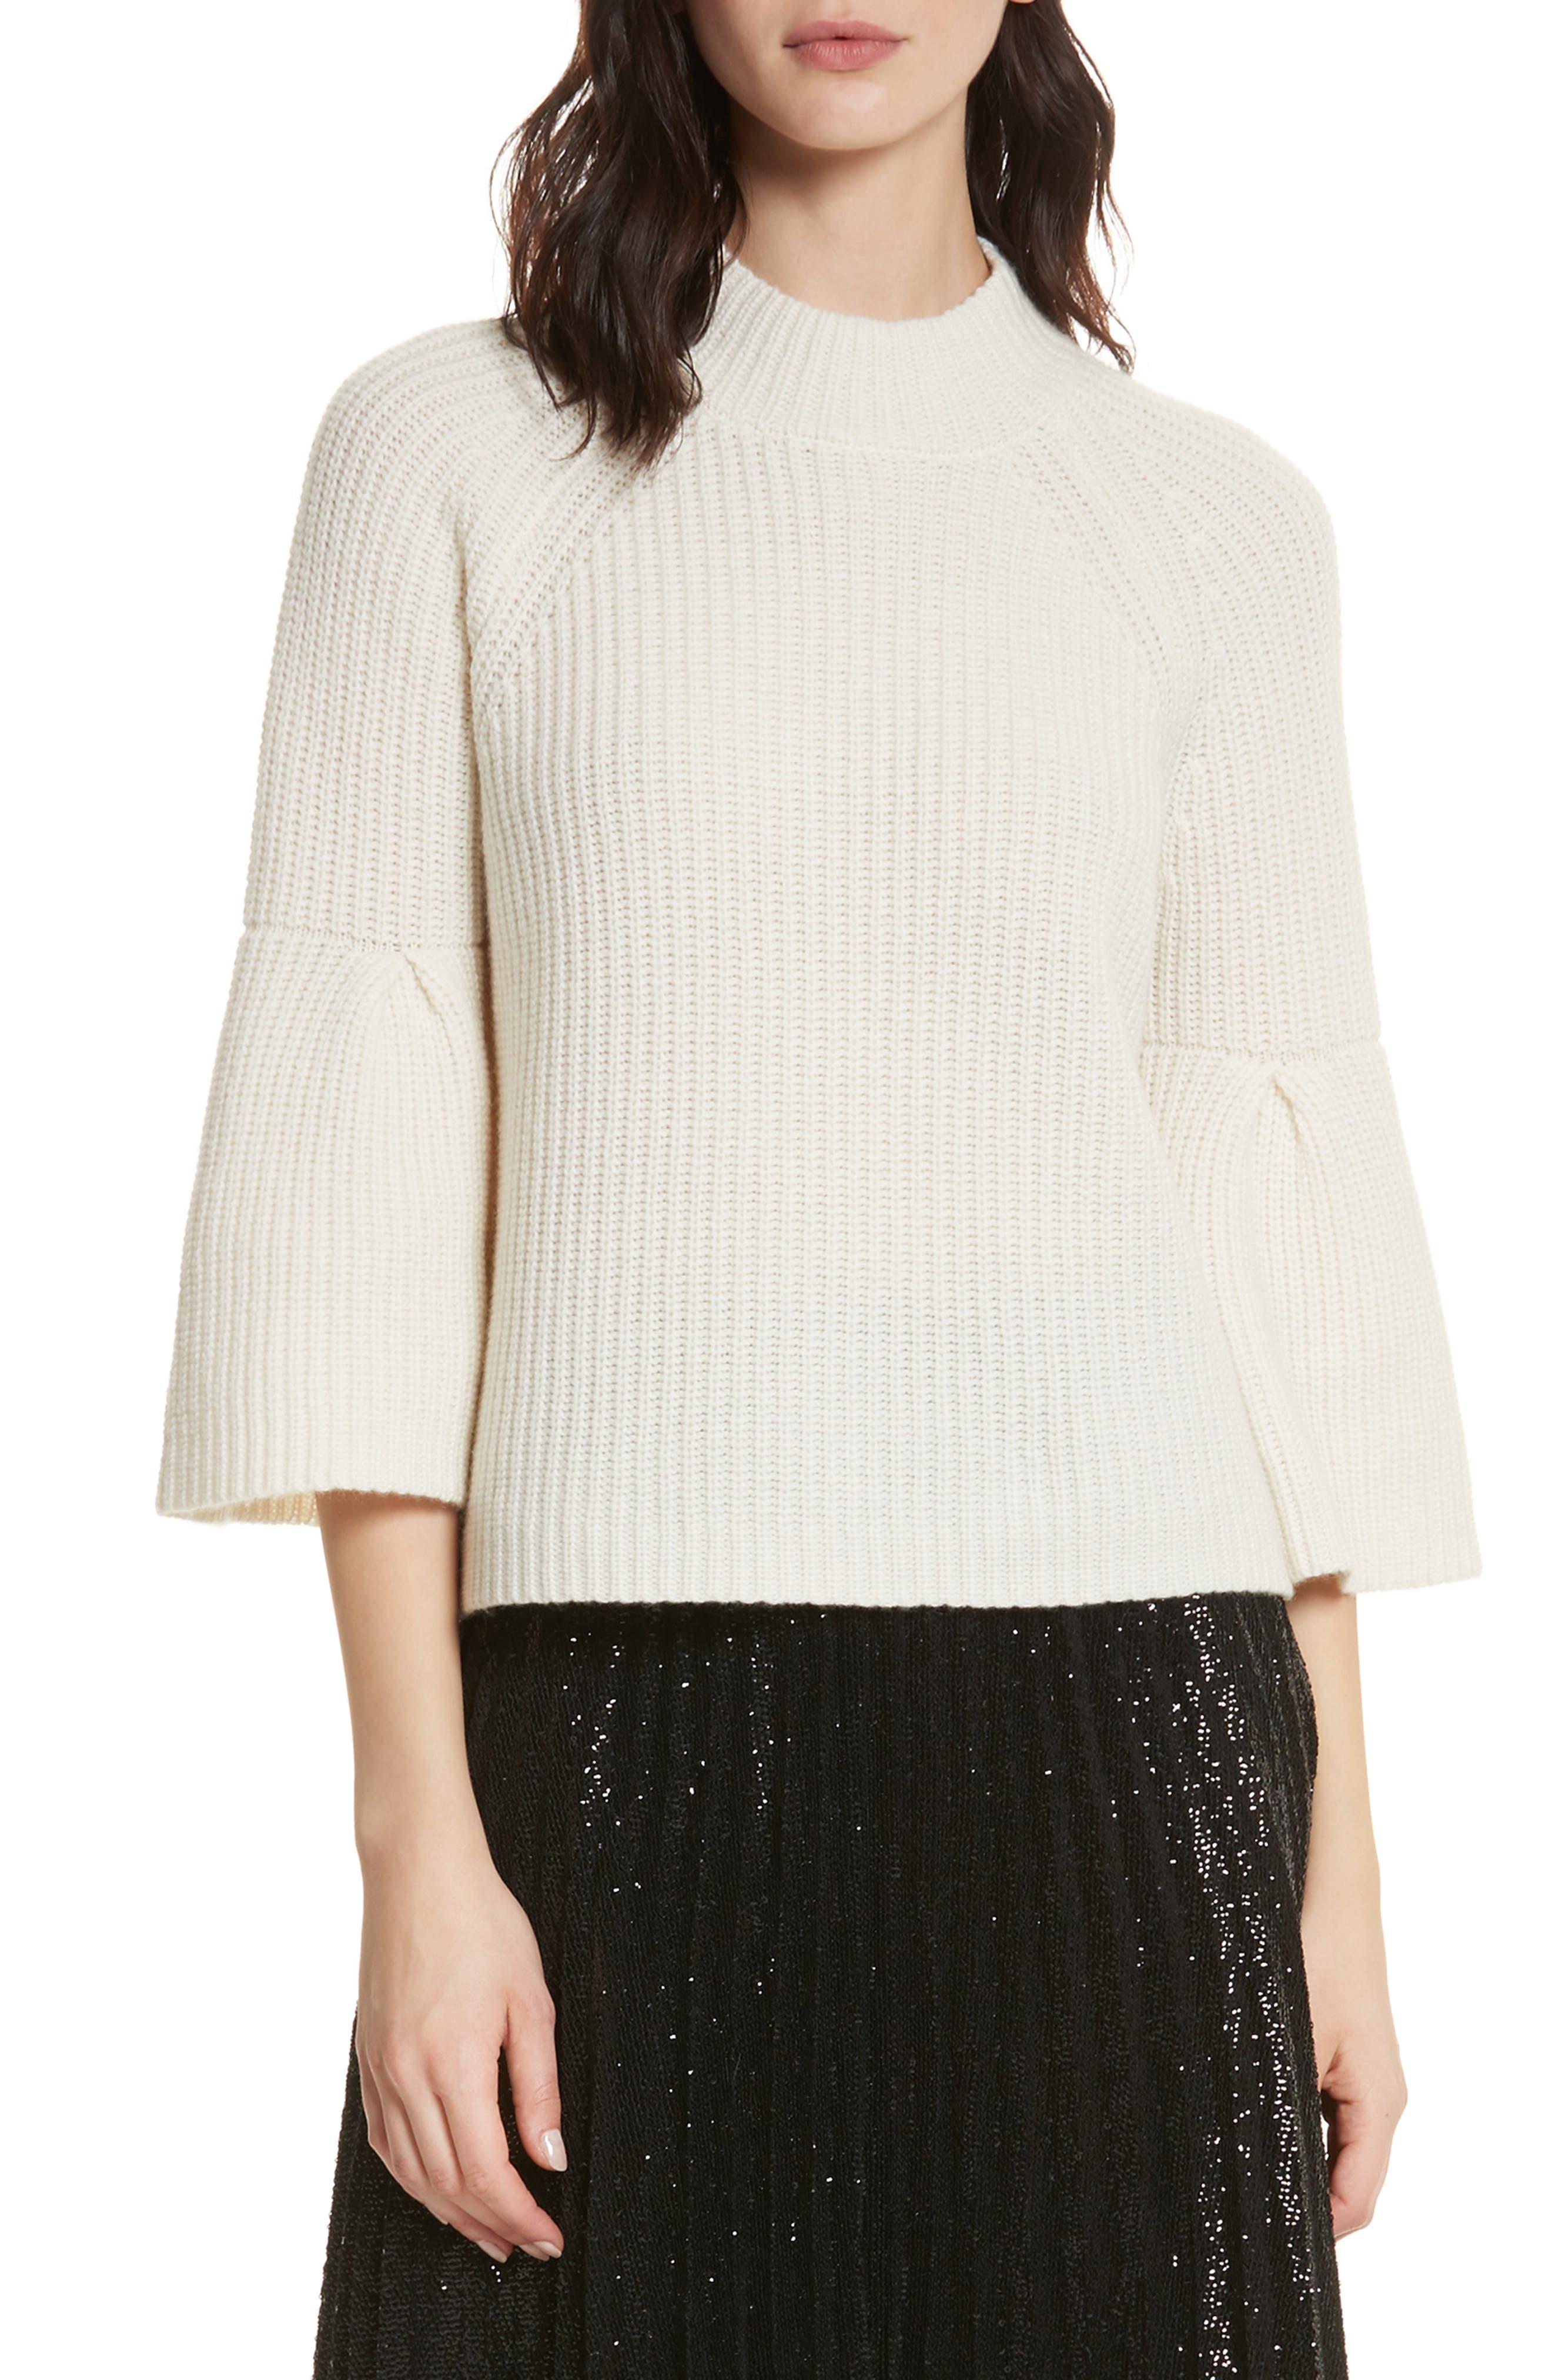 Joie Ingrit Wool & Cashmere Sweater